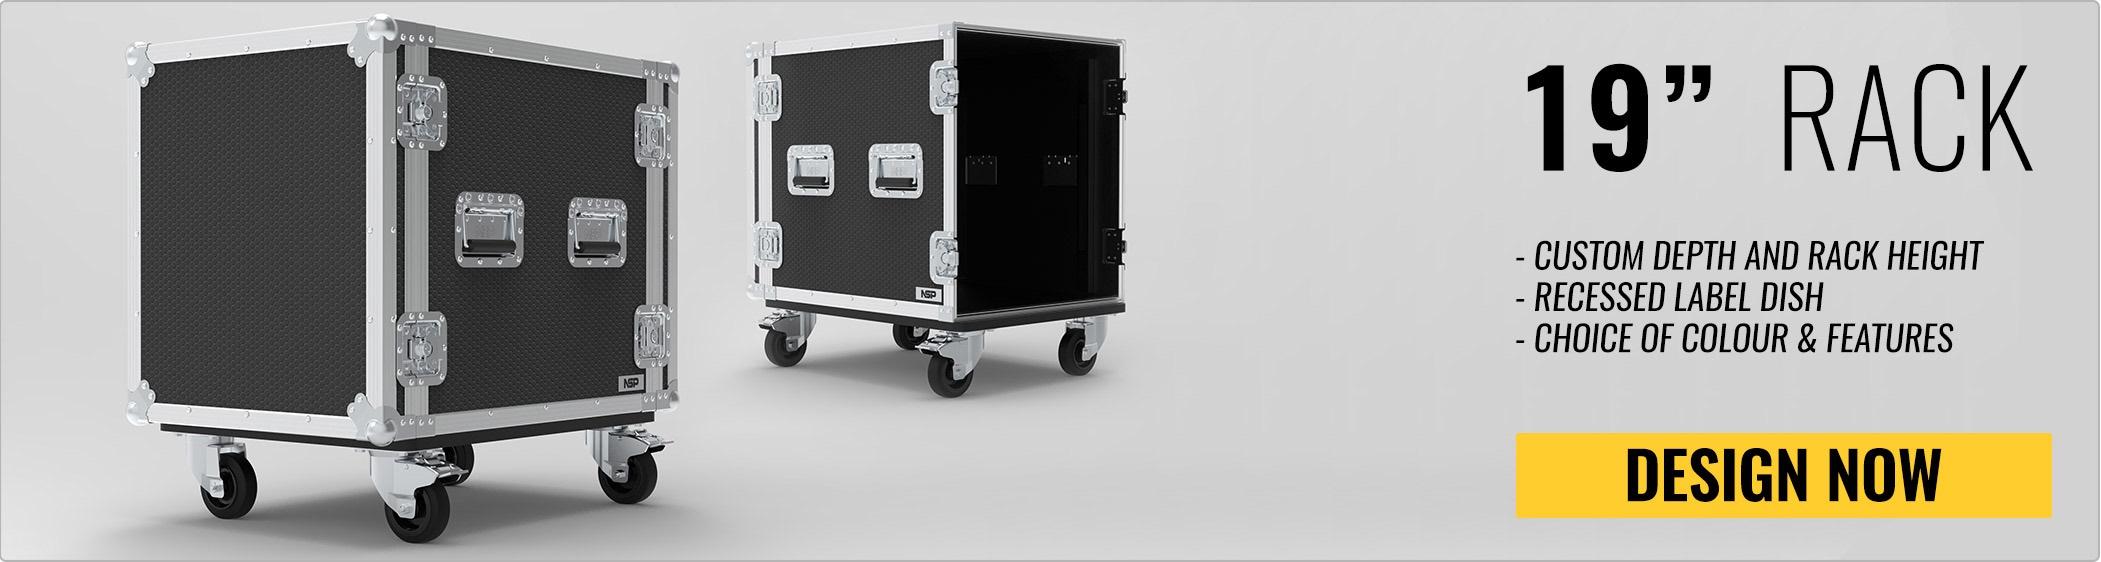 Design your own Rack Case